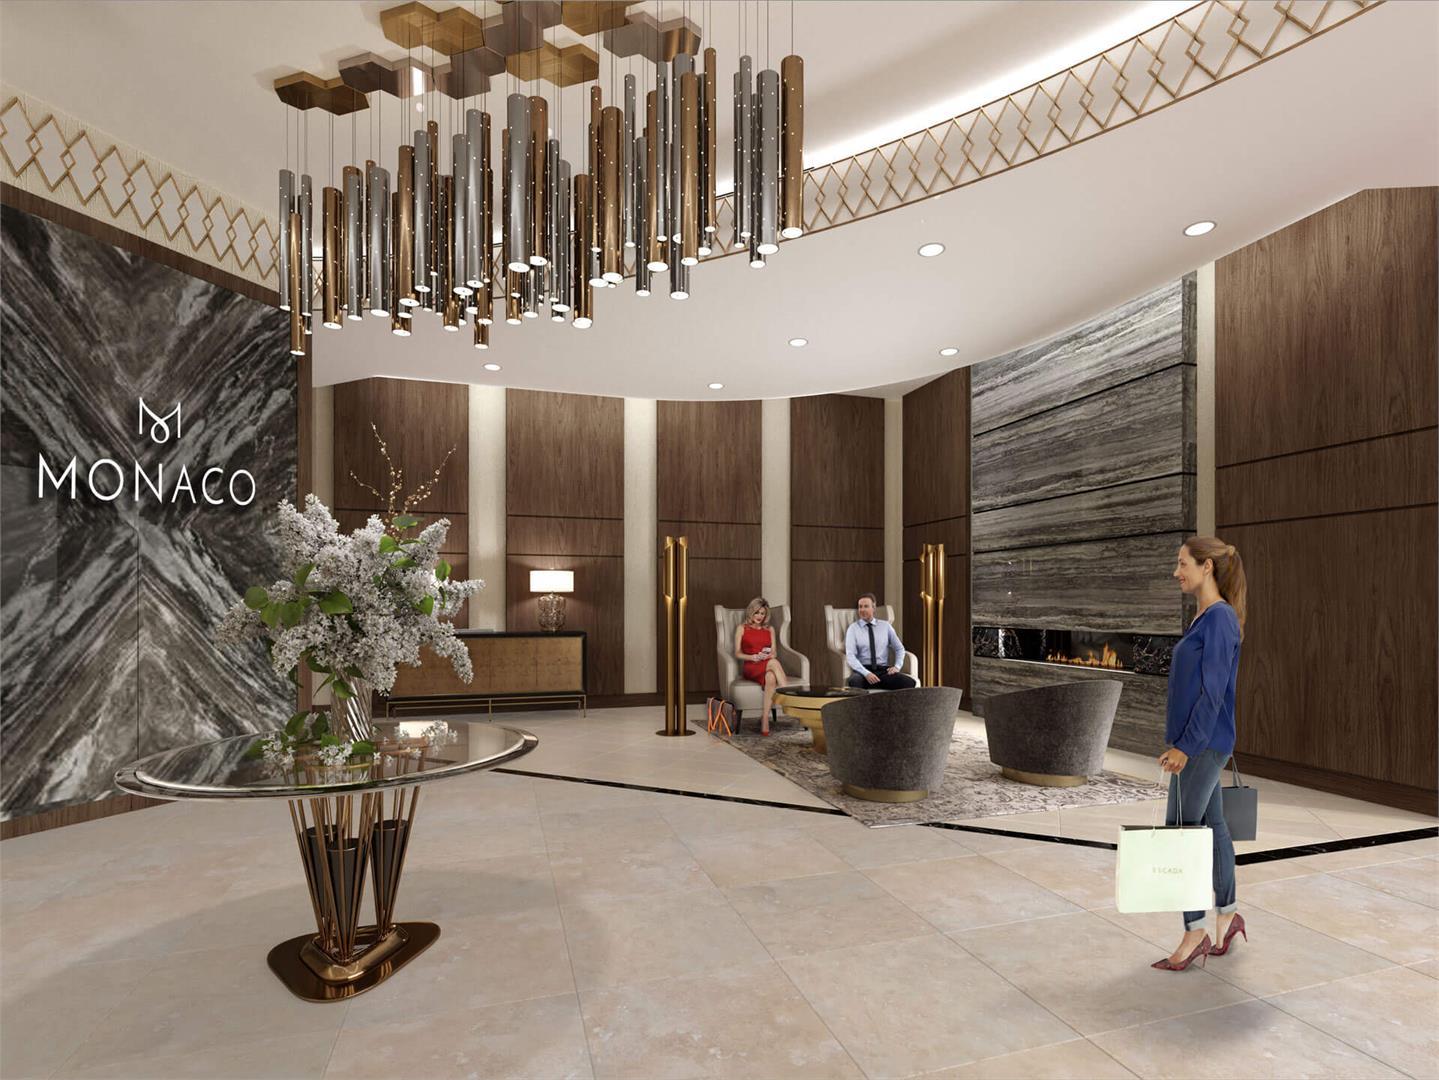 Monaco Lobby